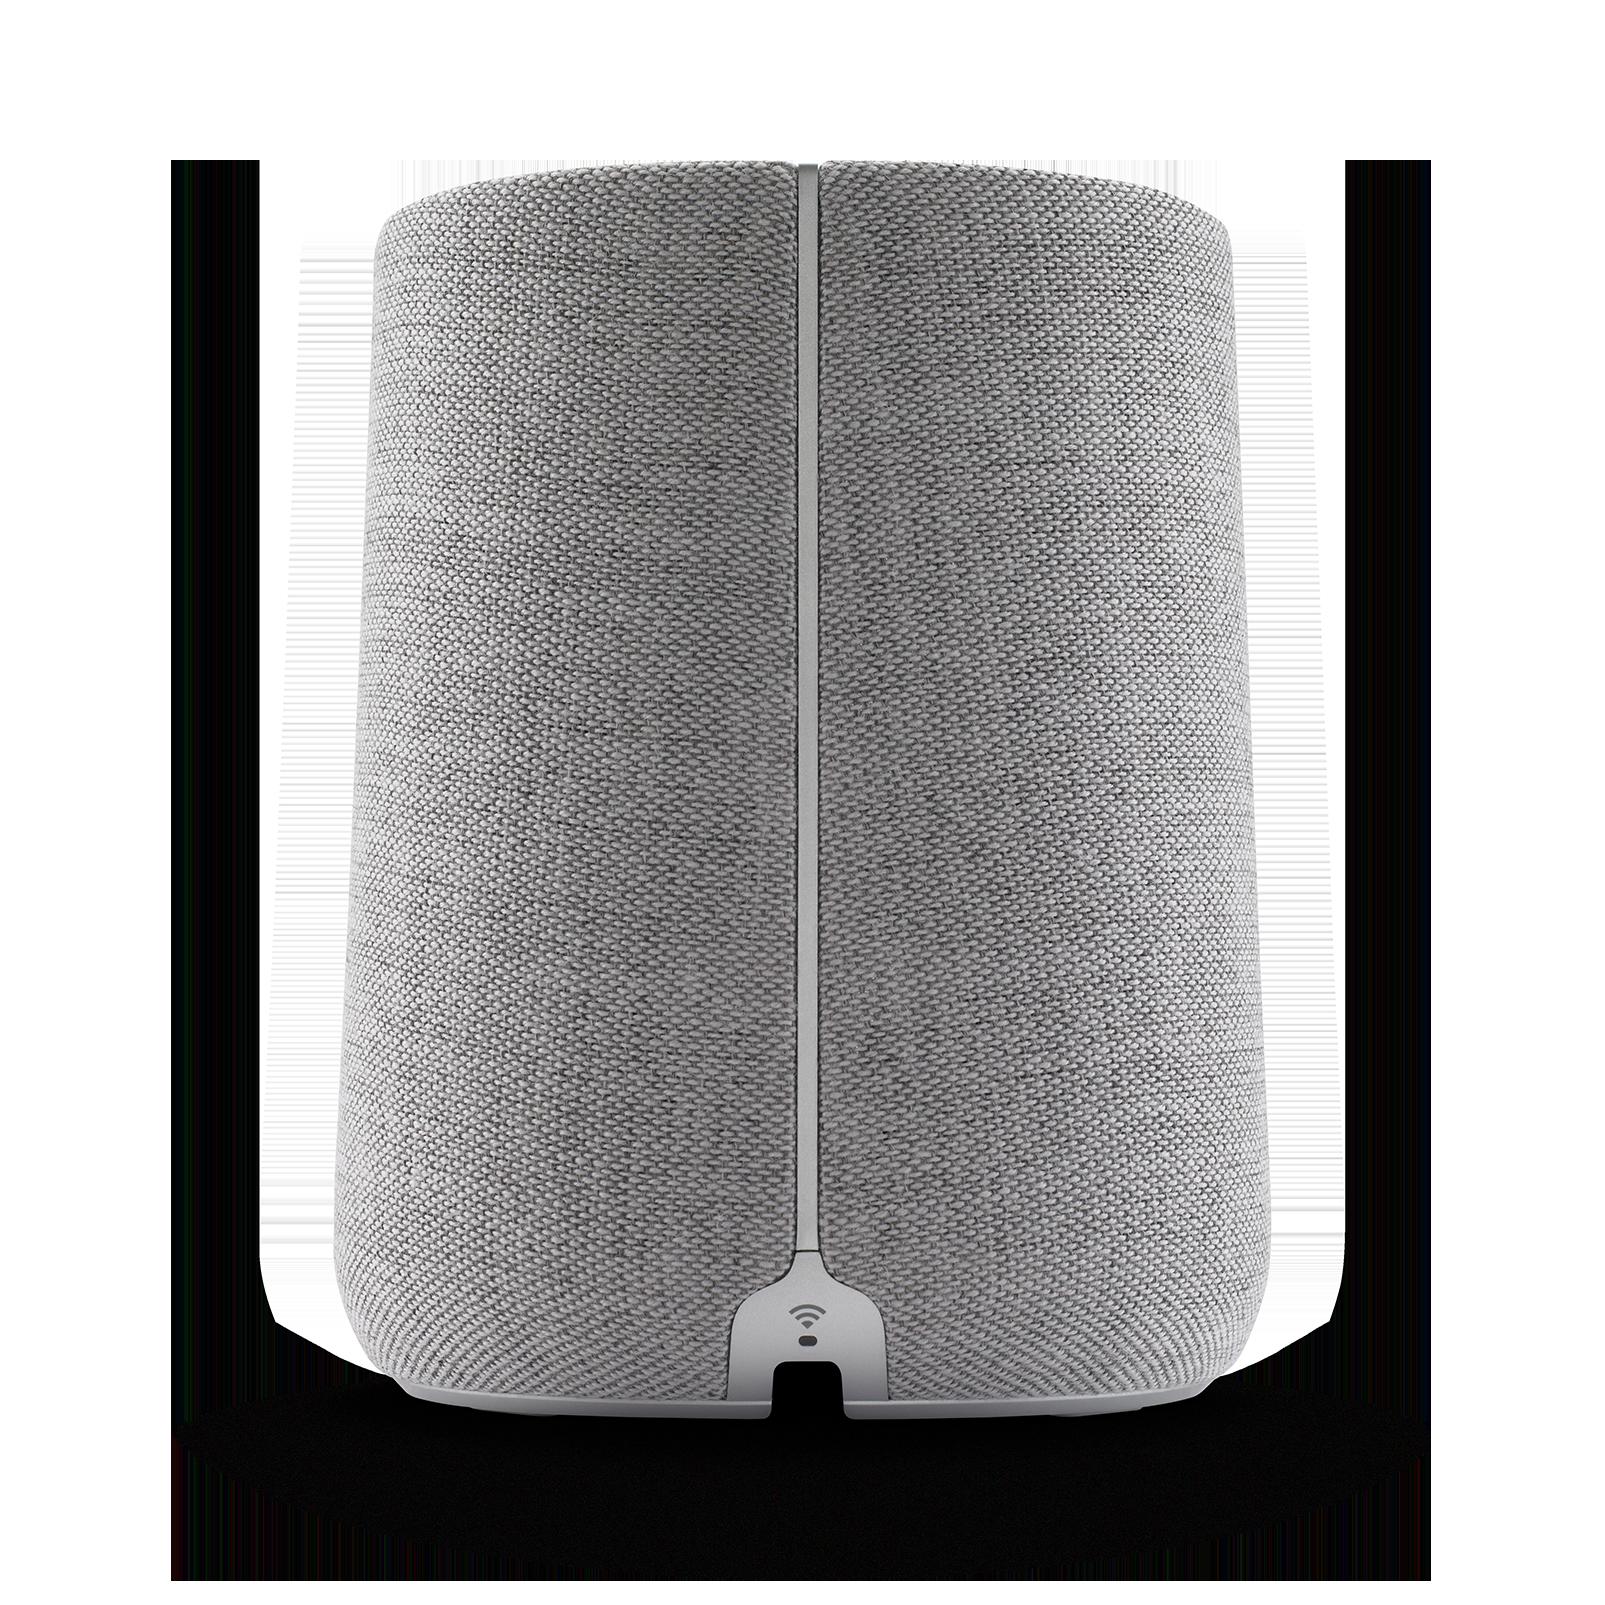 Harman Kardon Citation ONE - Grey - Compact, smart and amazing sound - Back